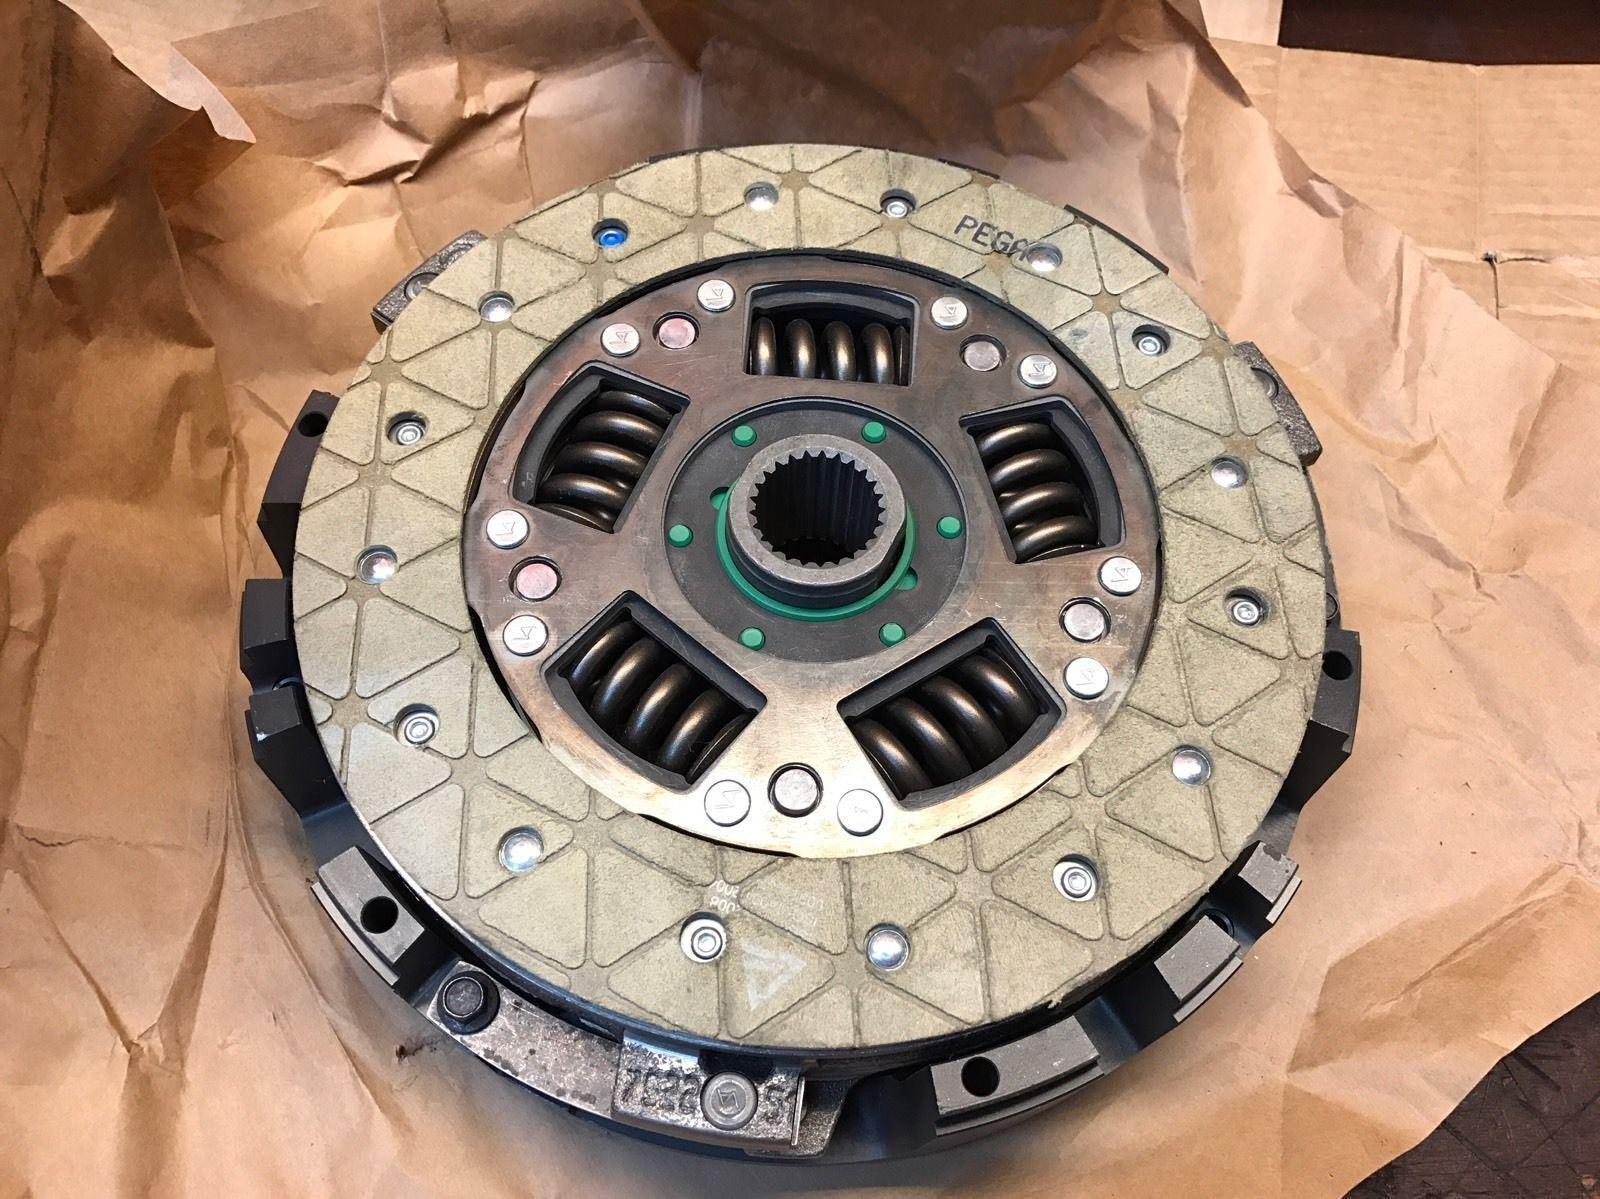 22671020 GM original equipment replacement heavy-duty pressure engine coolant reservoir cover ASOOLL 15066786 22652695 15075118 radiator regulator cover 15 P.S.I